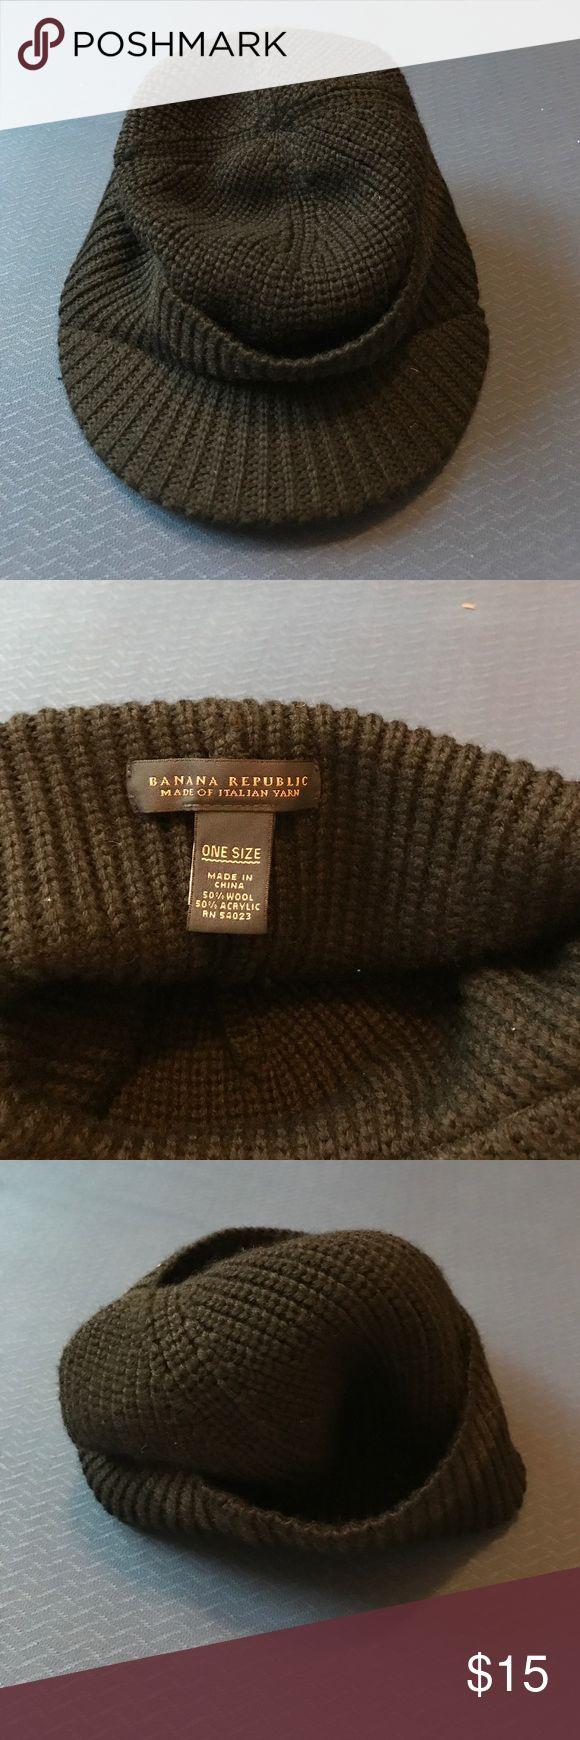 Men's Wool hat EUC Men's wool hat. 50% wool 50% acrylic Banana Republic Accessories Hats